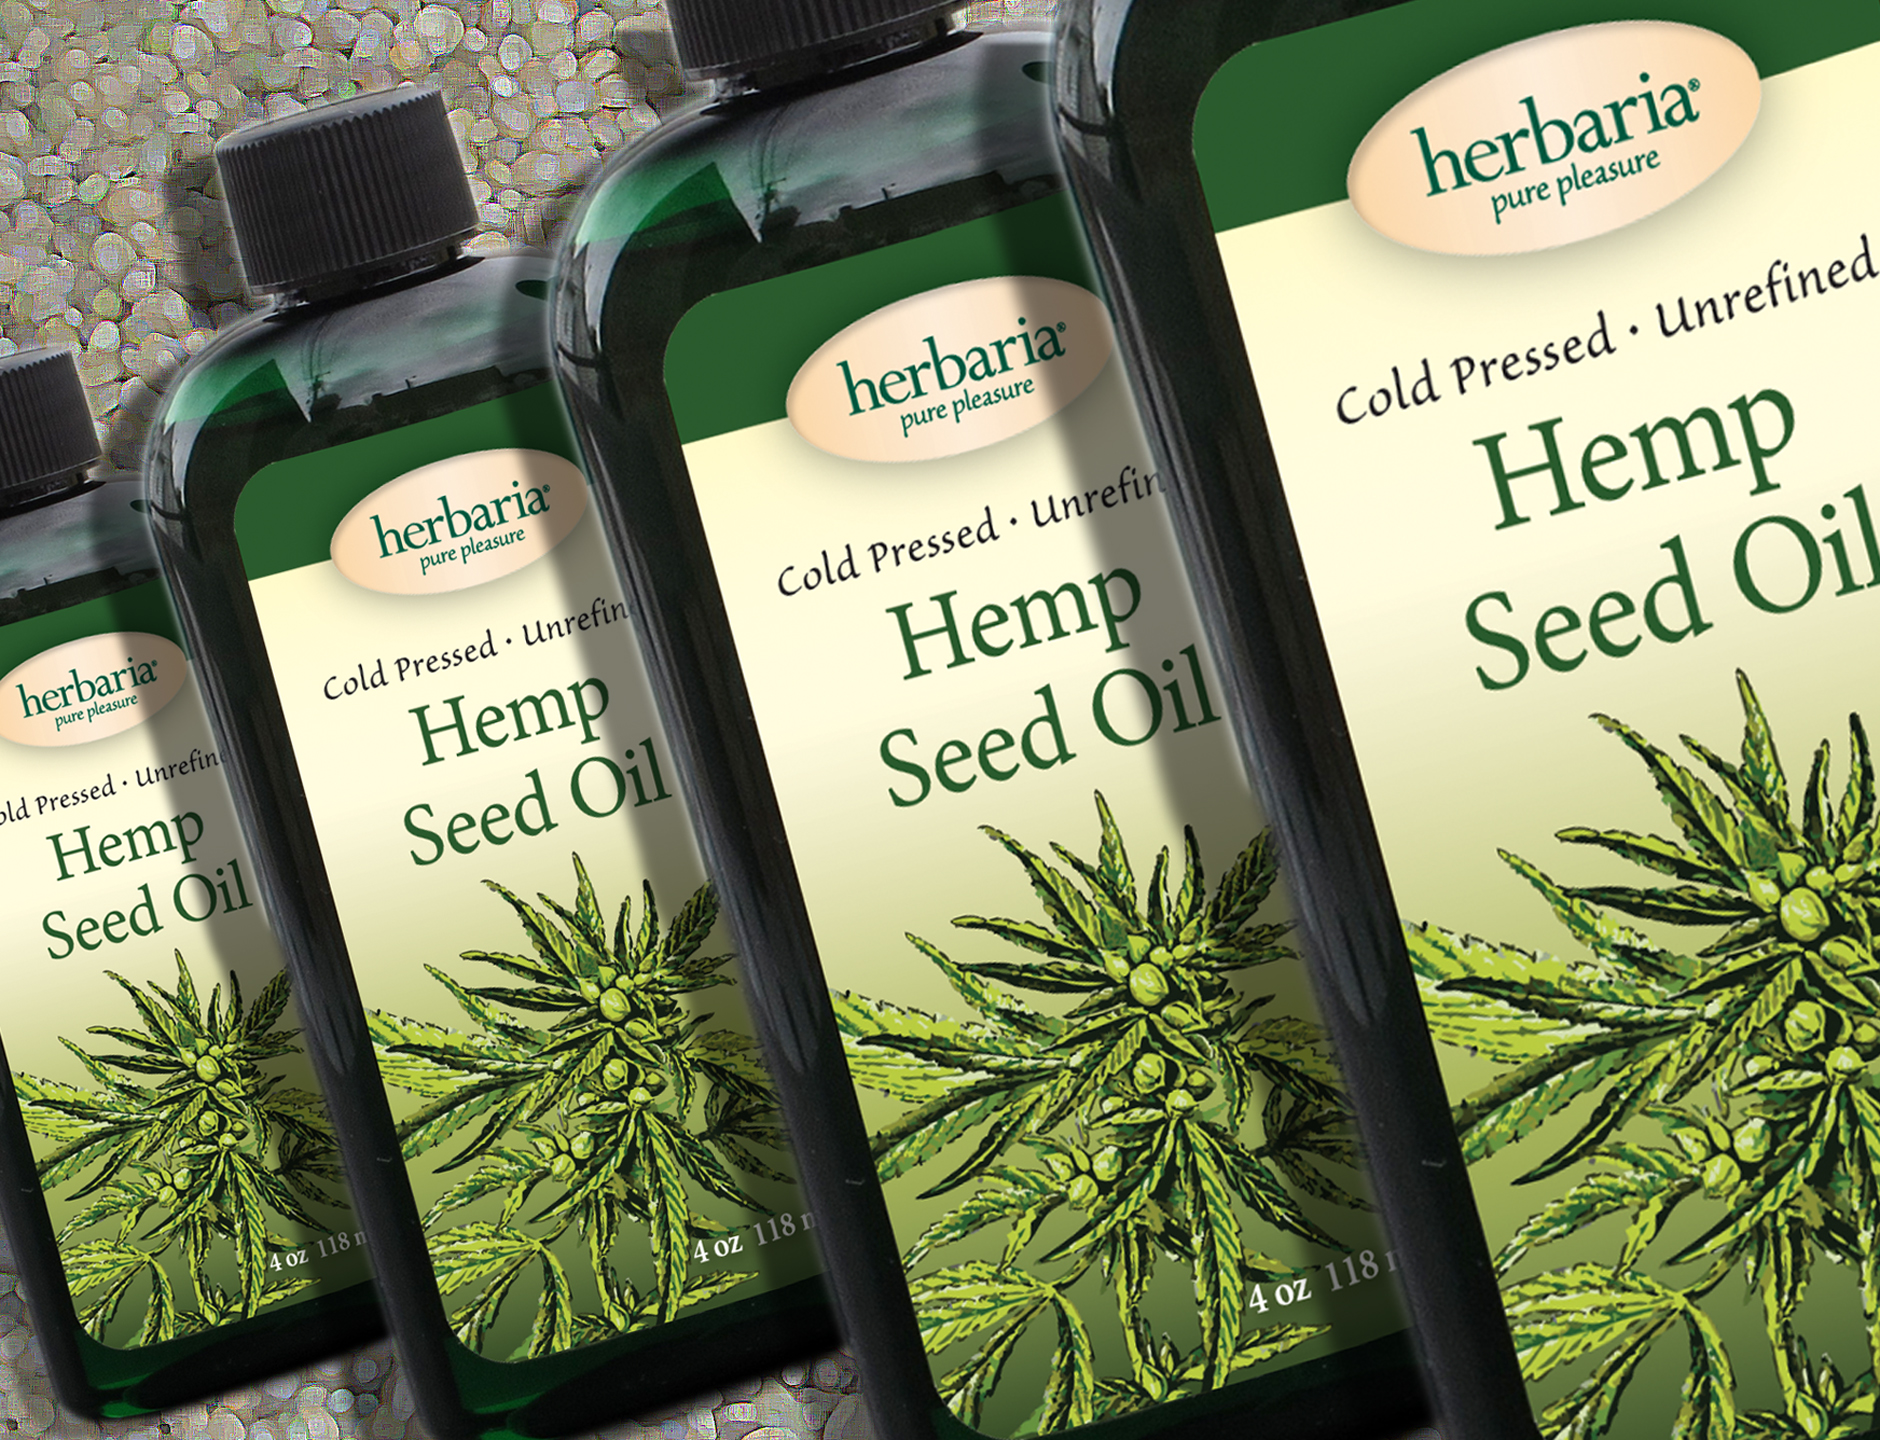 Herbaria Hemp Seed Oil Cold Pressed Unrefined